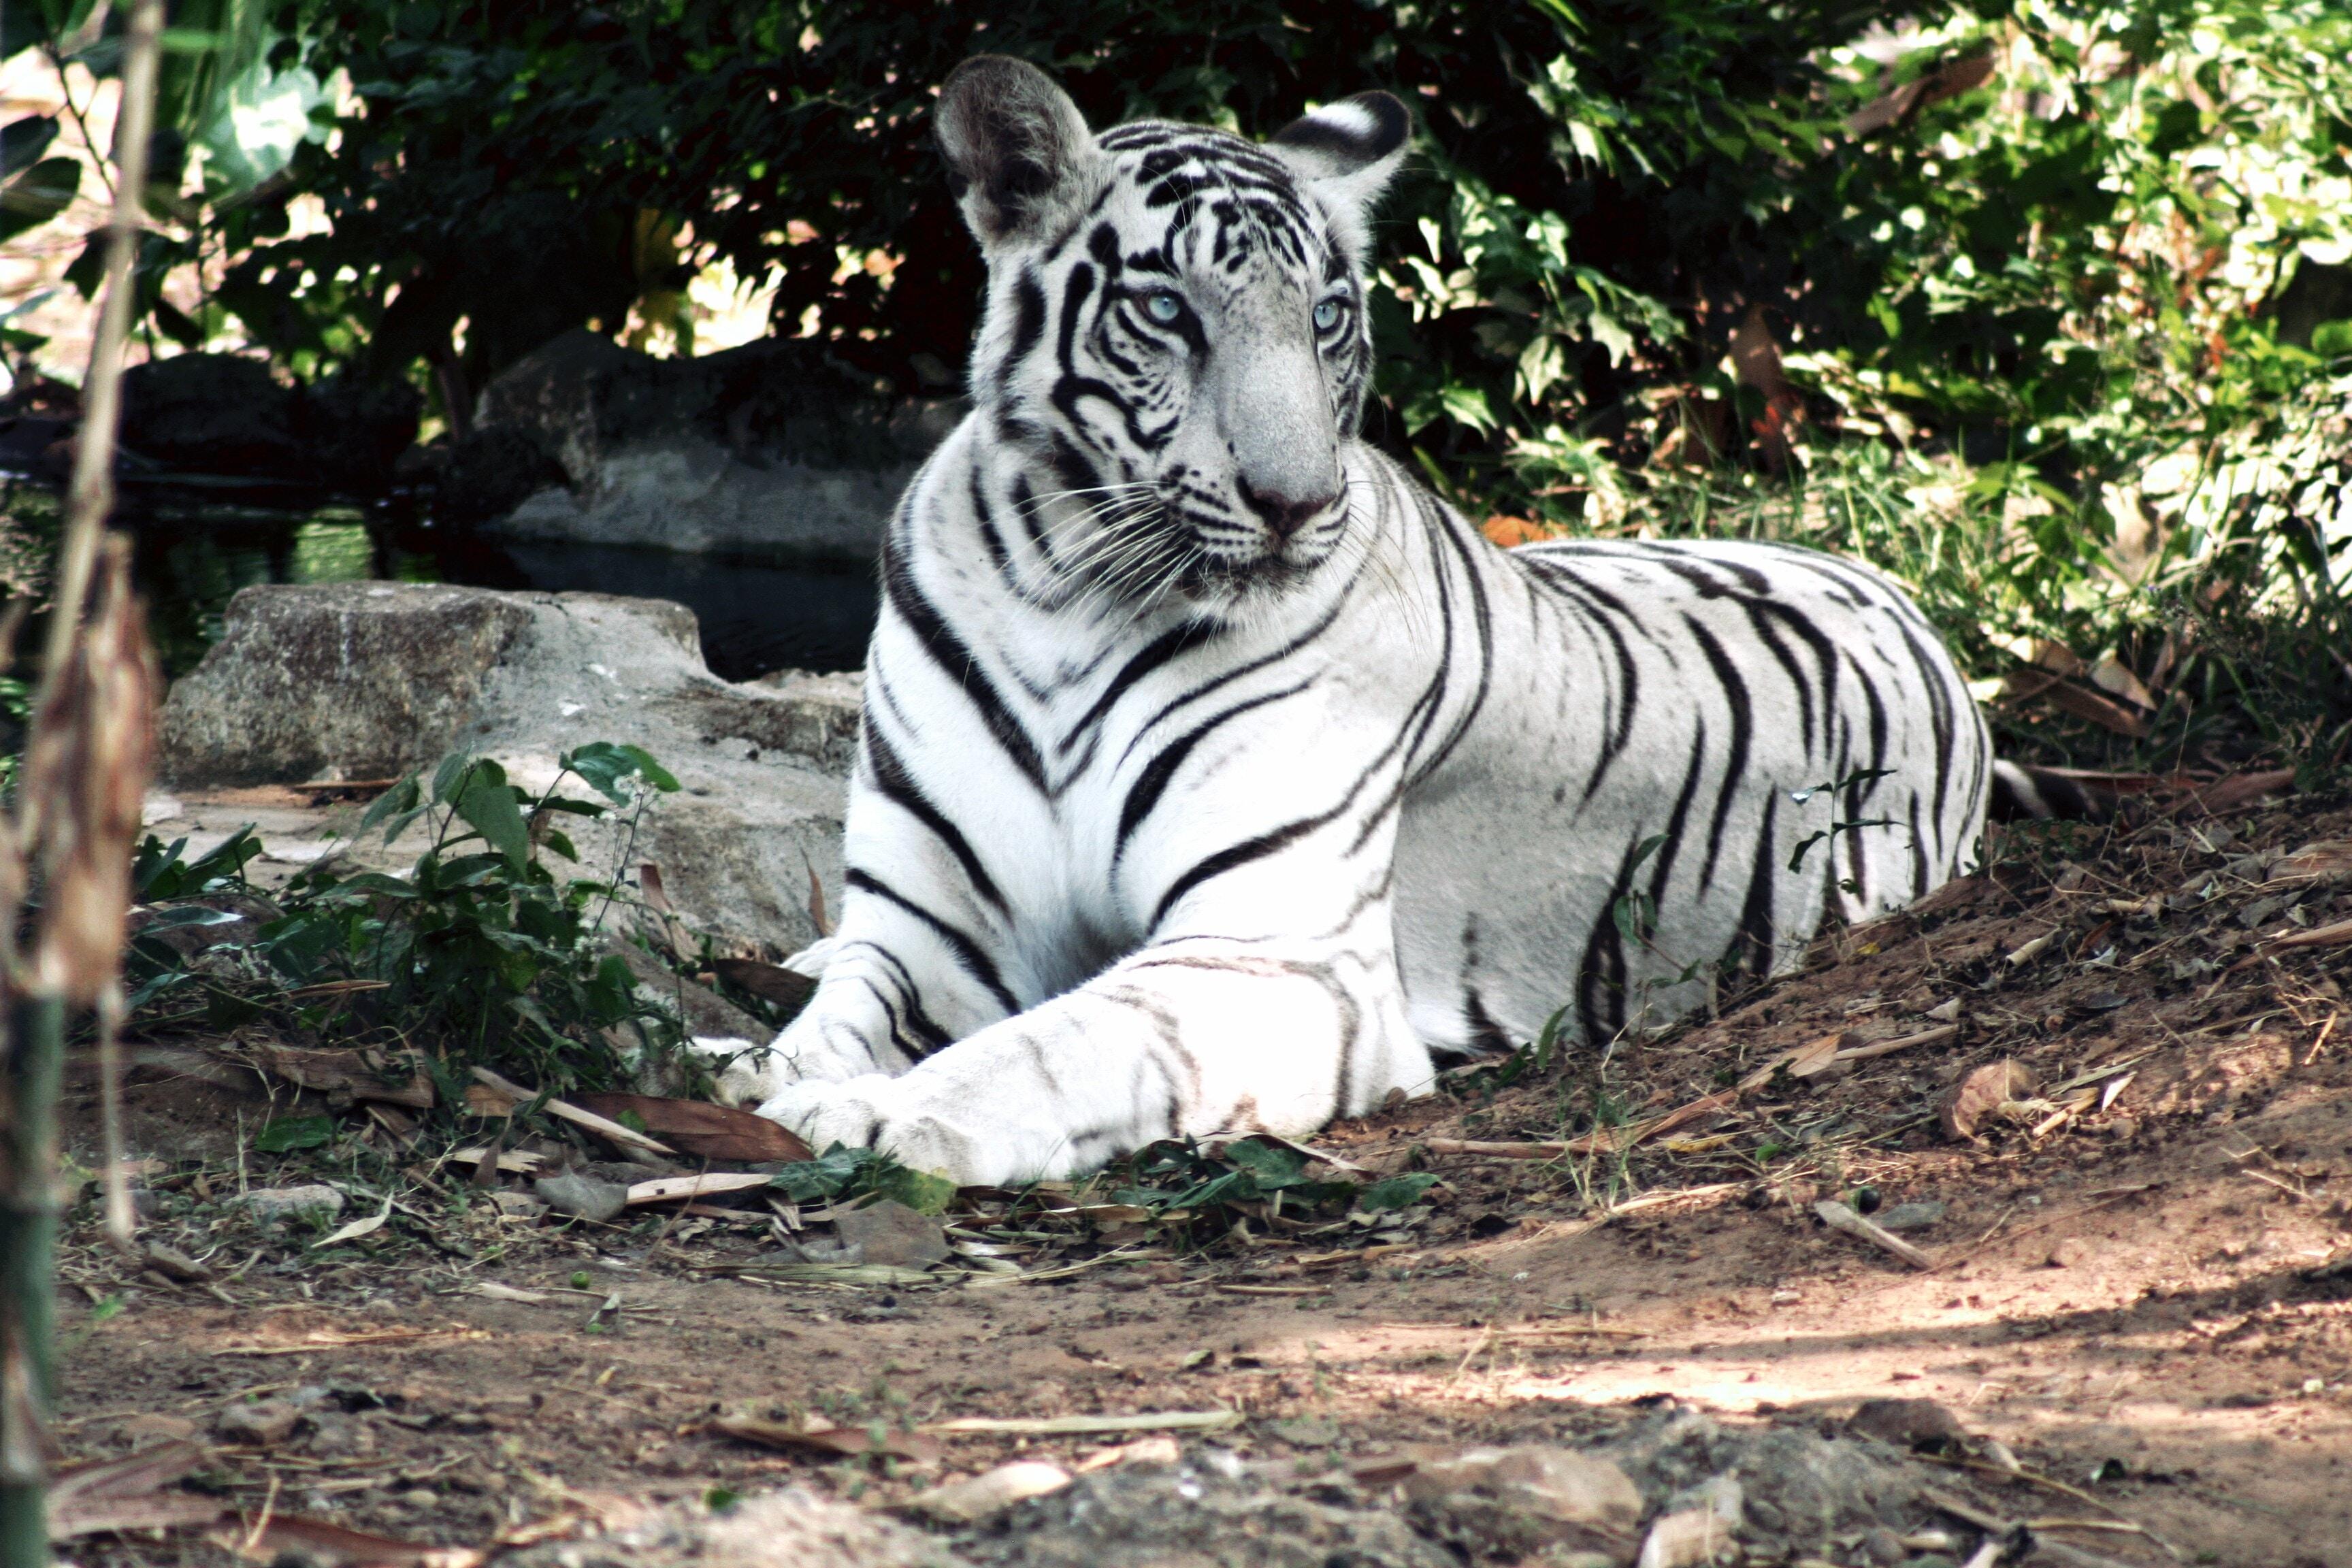 albino bengal tiger lying on ground near green plant